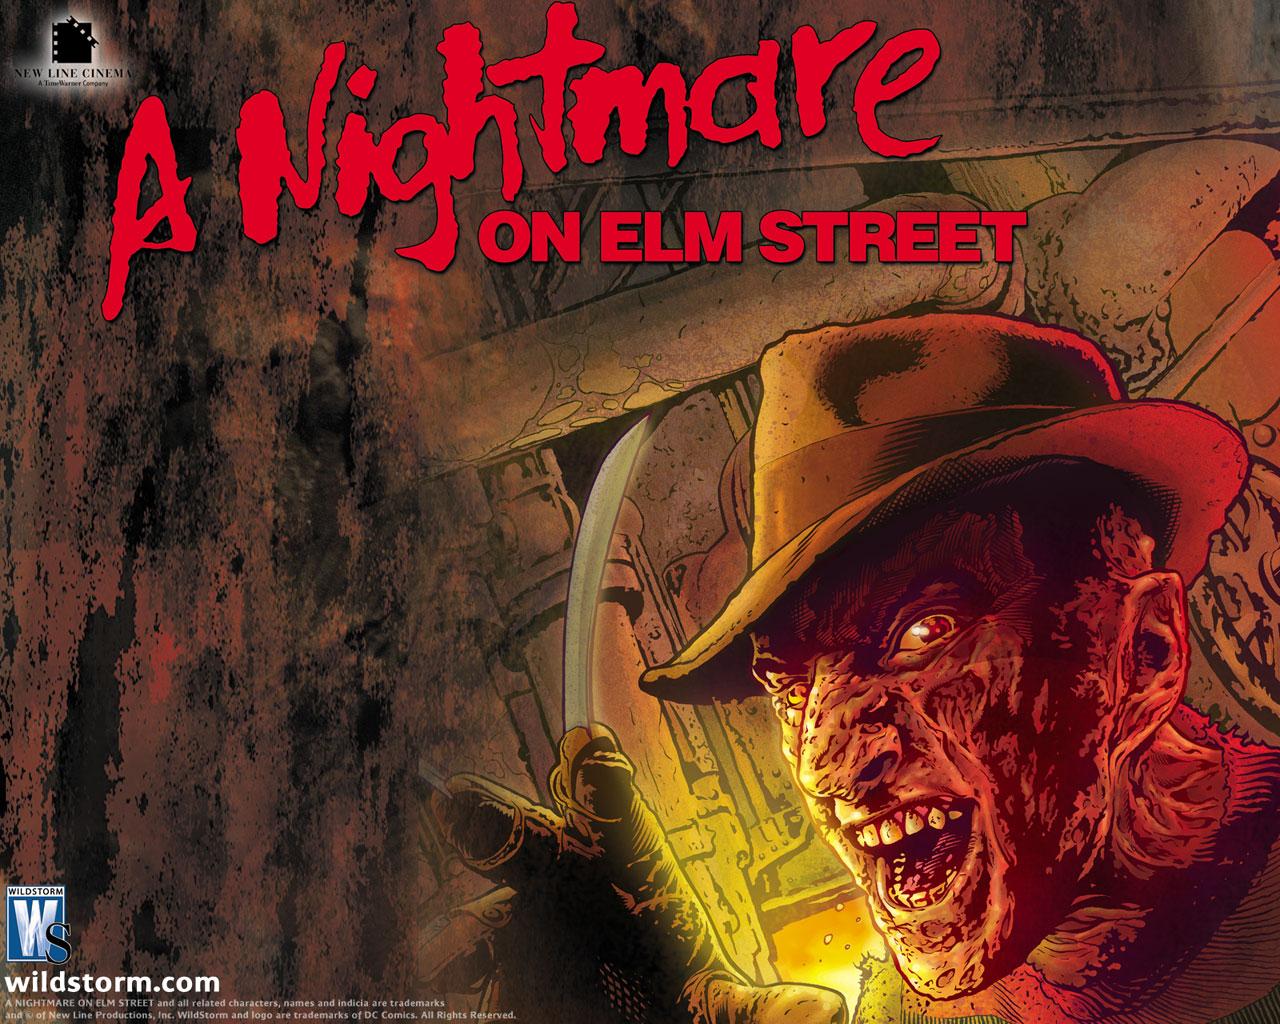 Nightmare On Elm St Quotes: Nightmare On Elm Street Part 2 - Forum